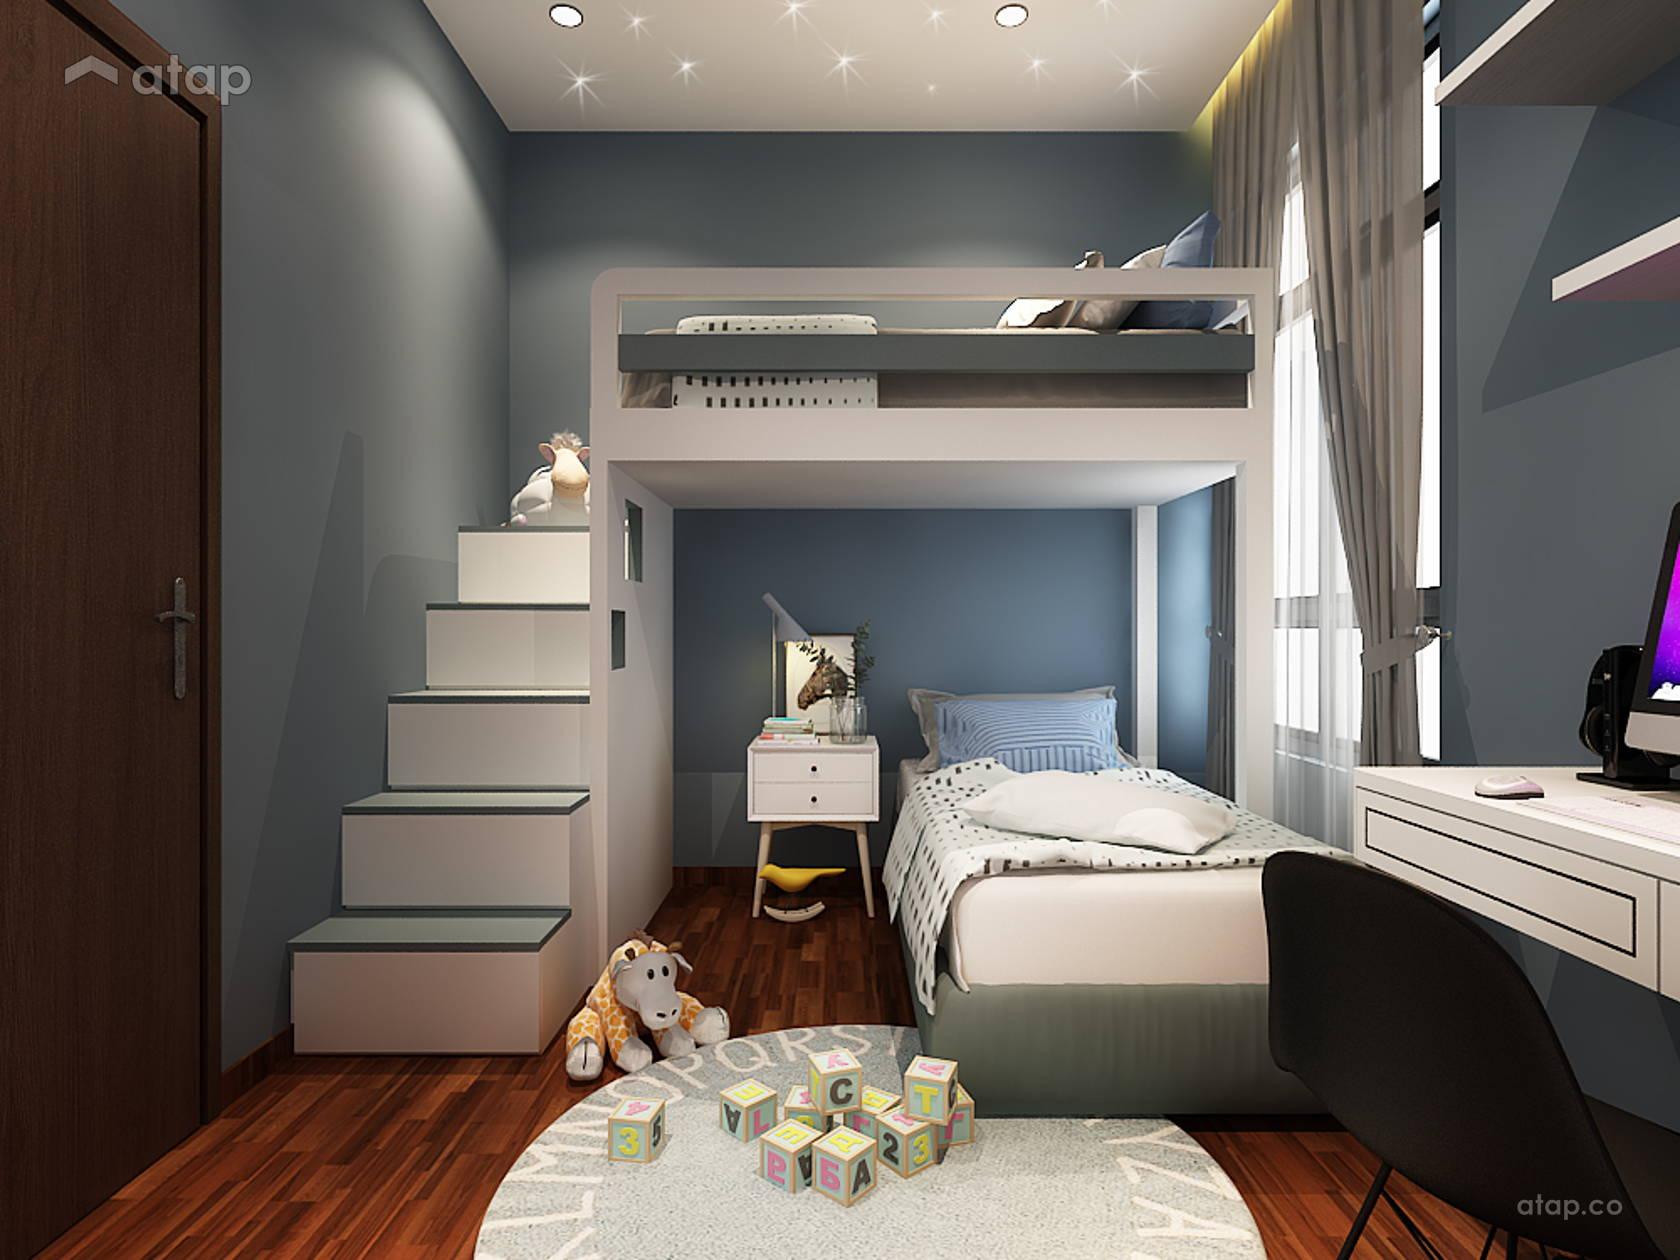 Sensational Classic Modern Bedroom Kids Terrace Design Ideas Photos Download Free Architecture Designs Lectubocepmadebymaigaardcom